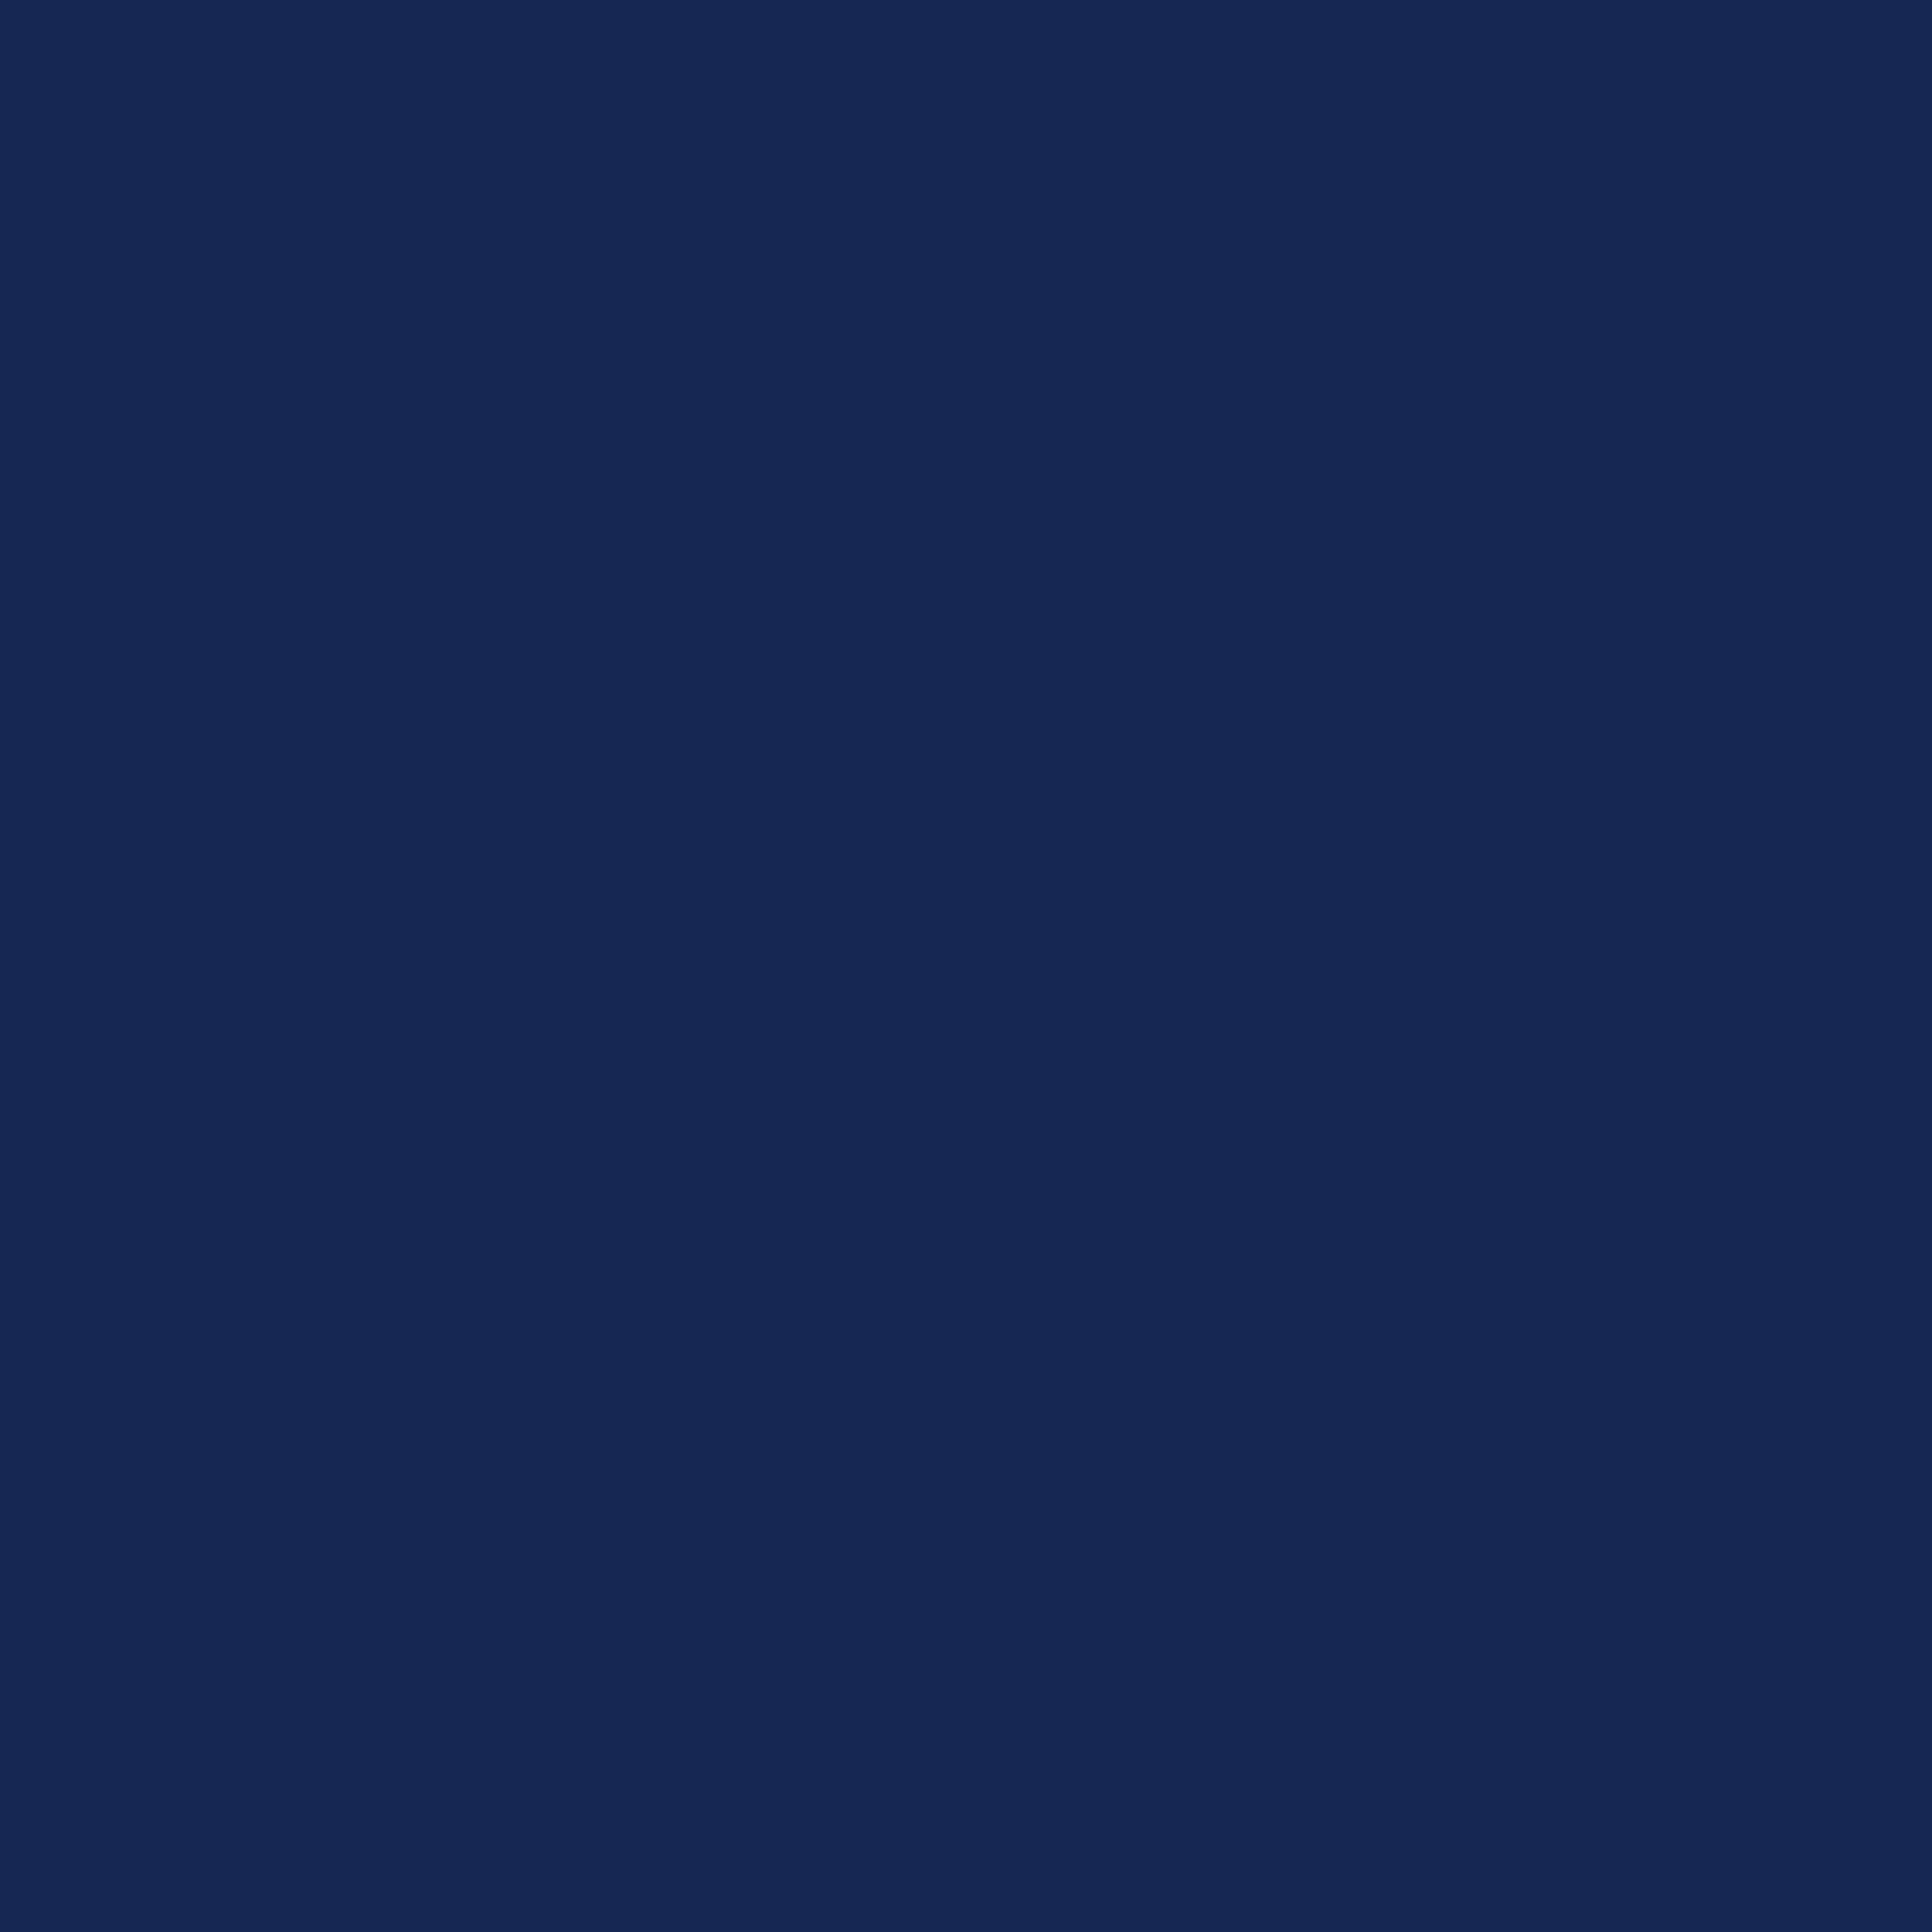 117 Navy Blue